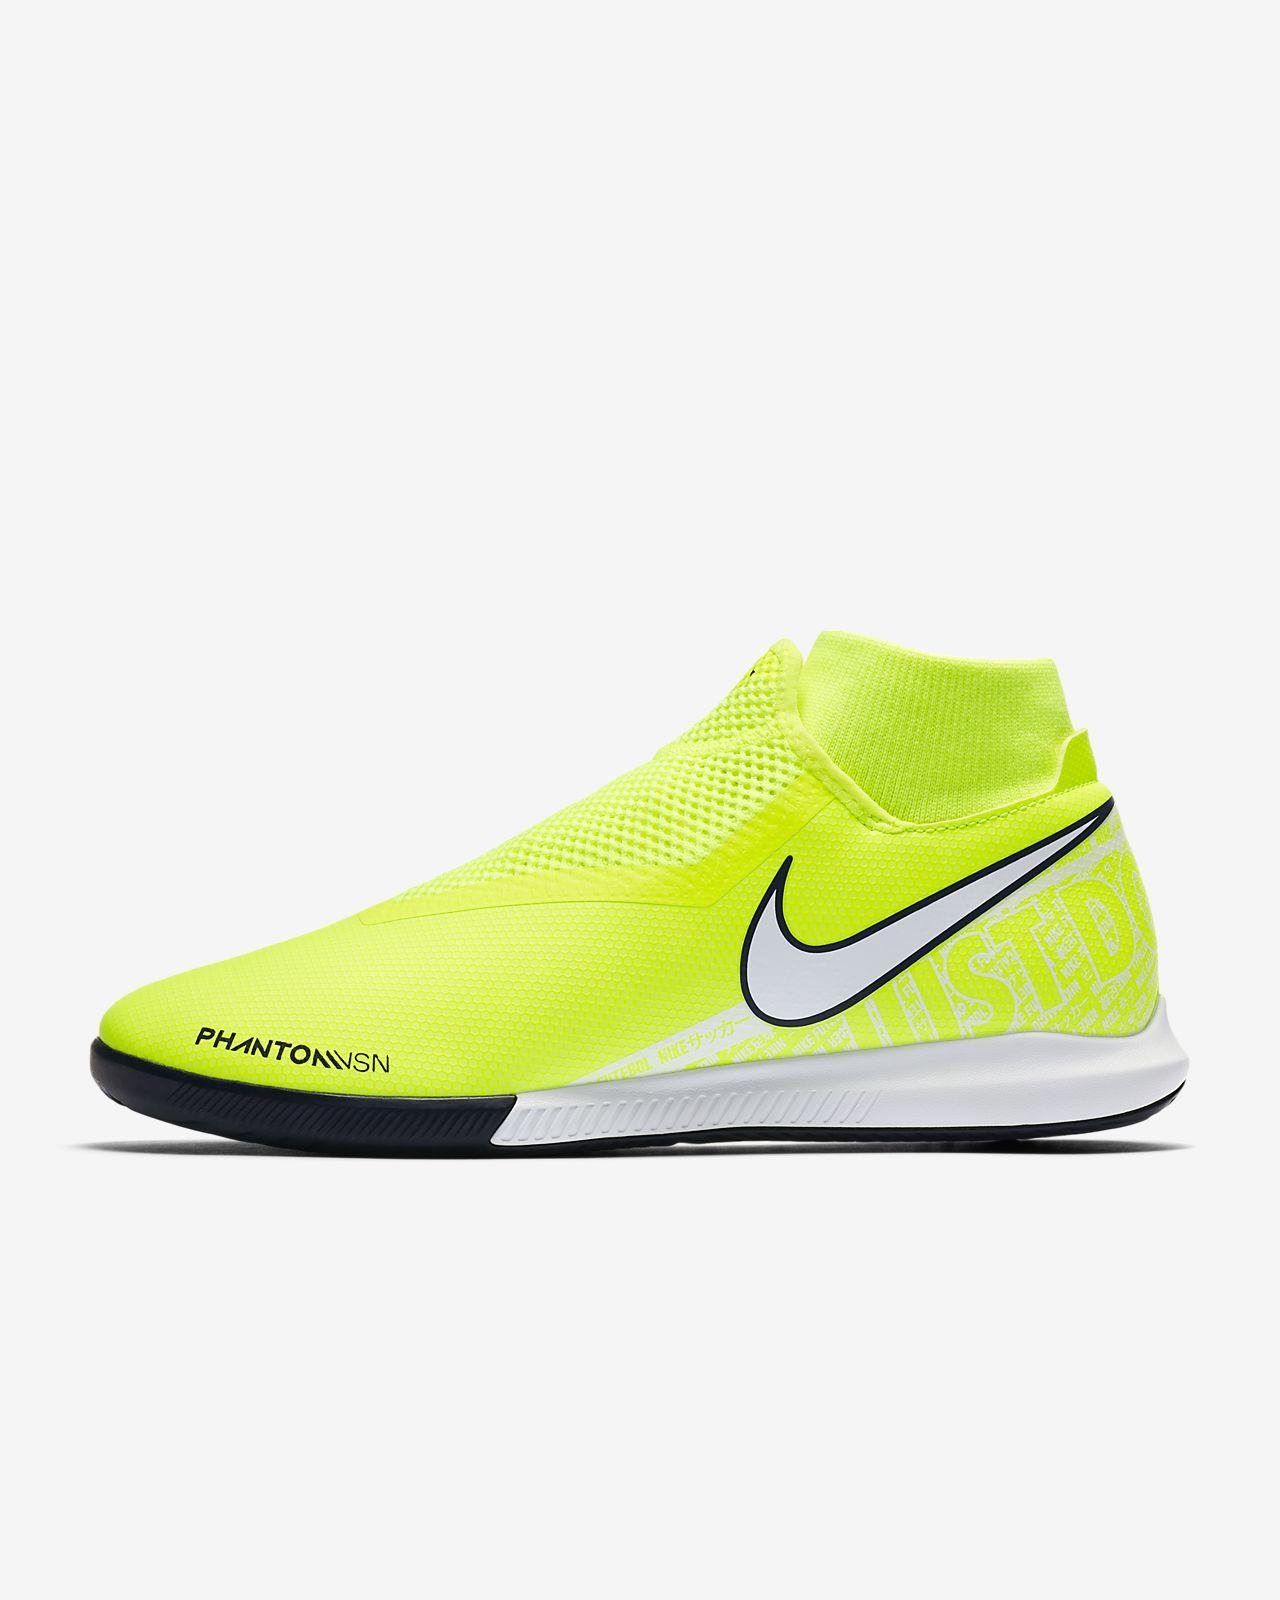 Calzado de fútbol para cancha cubierta Nike Phantom Vision Academy Dynamic Fit IC